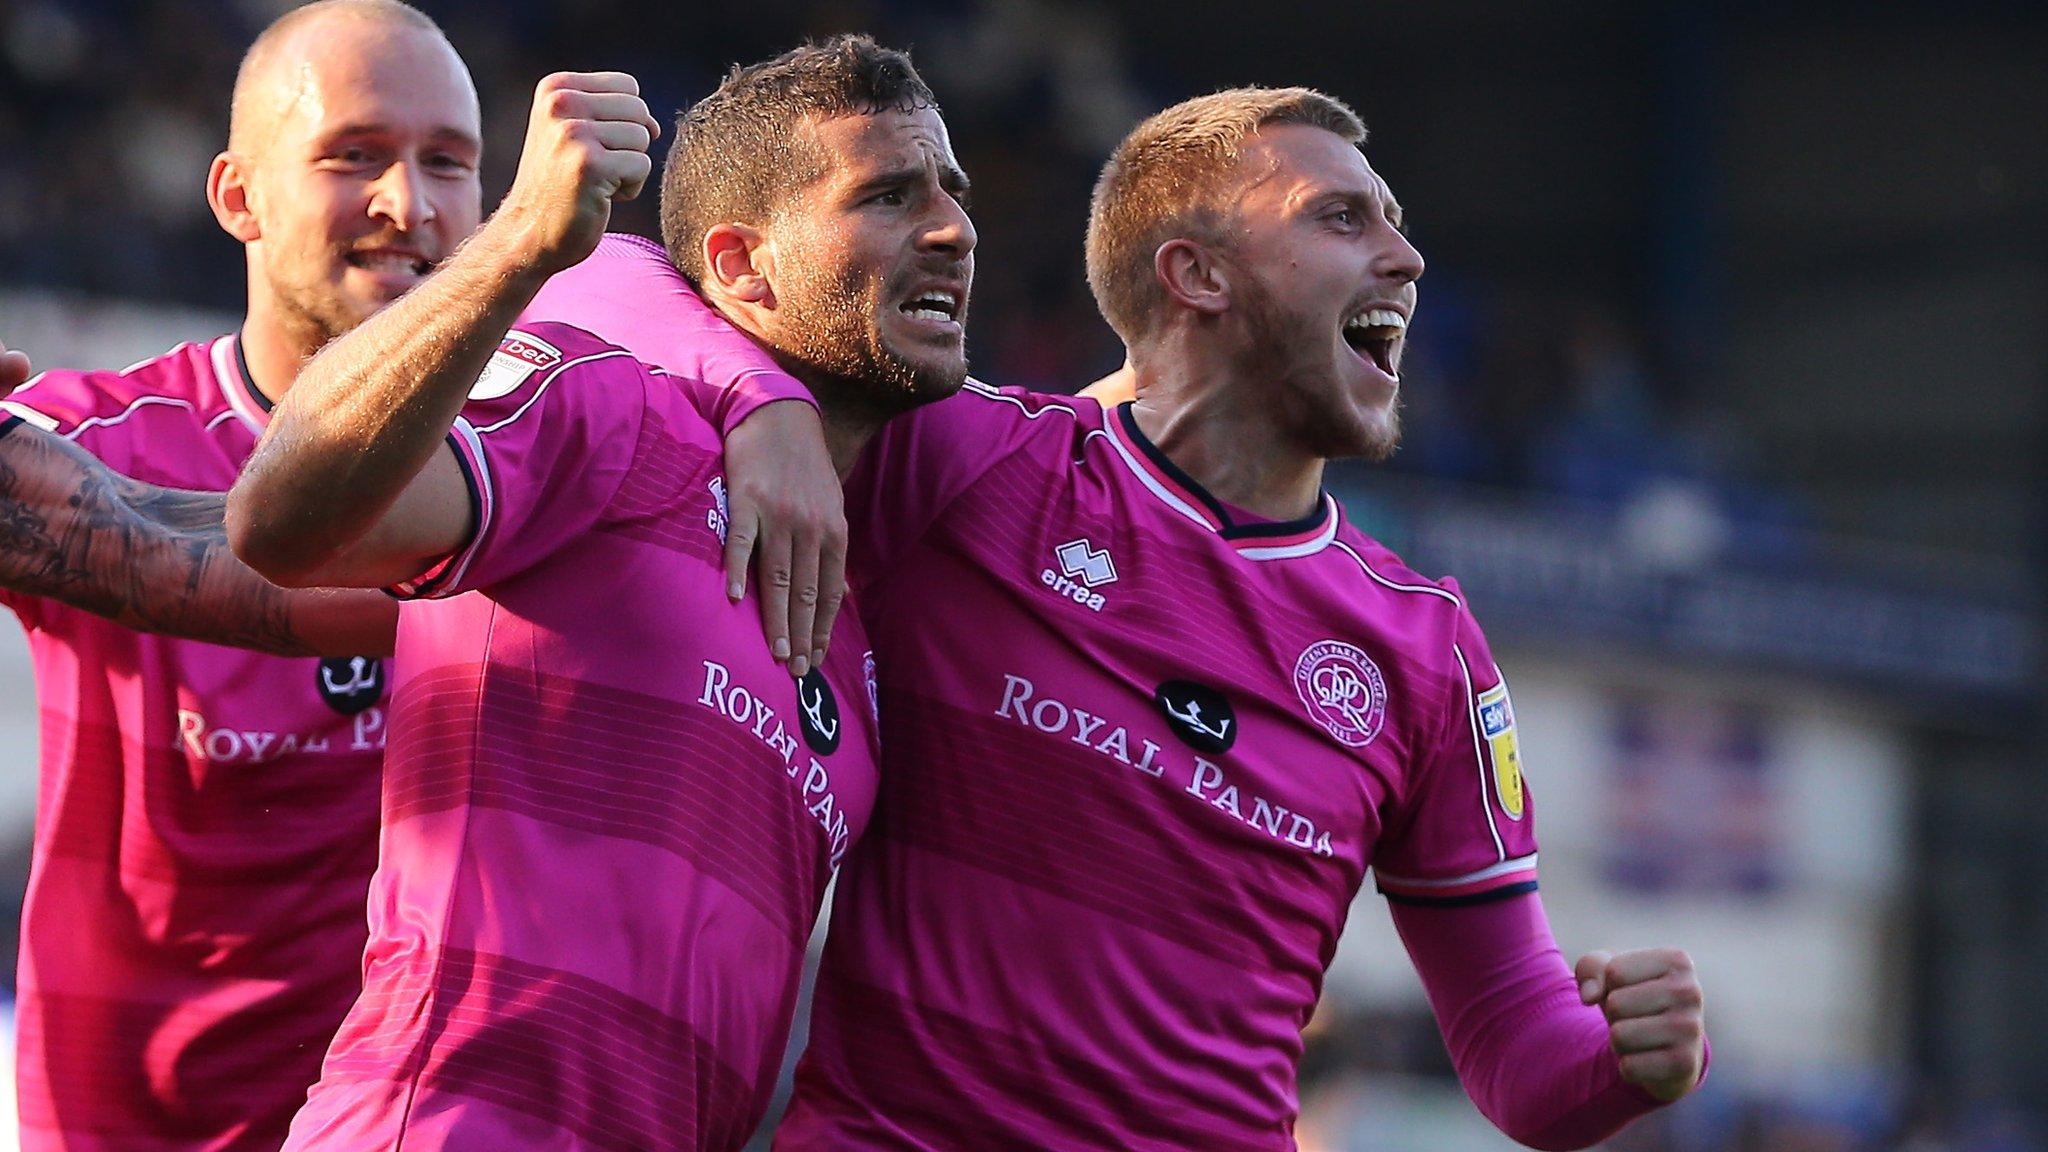 Ipswich Town 0-2 Queens Park Rangers: Pressure builds on Paul Hurst